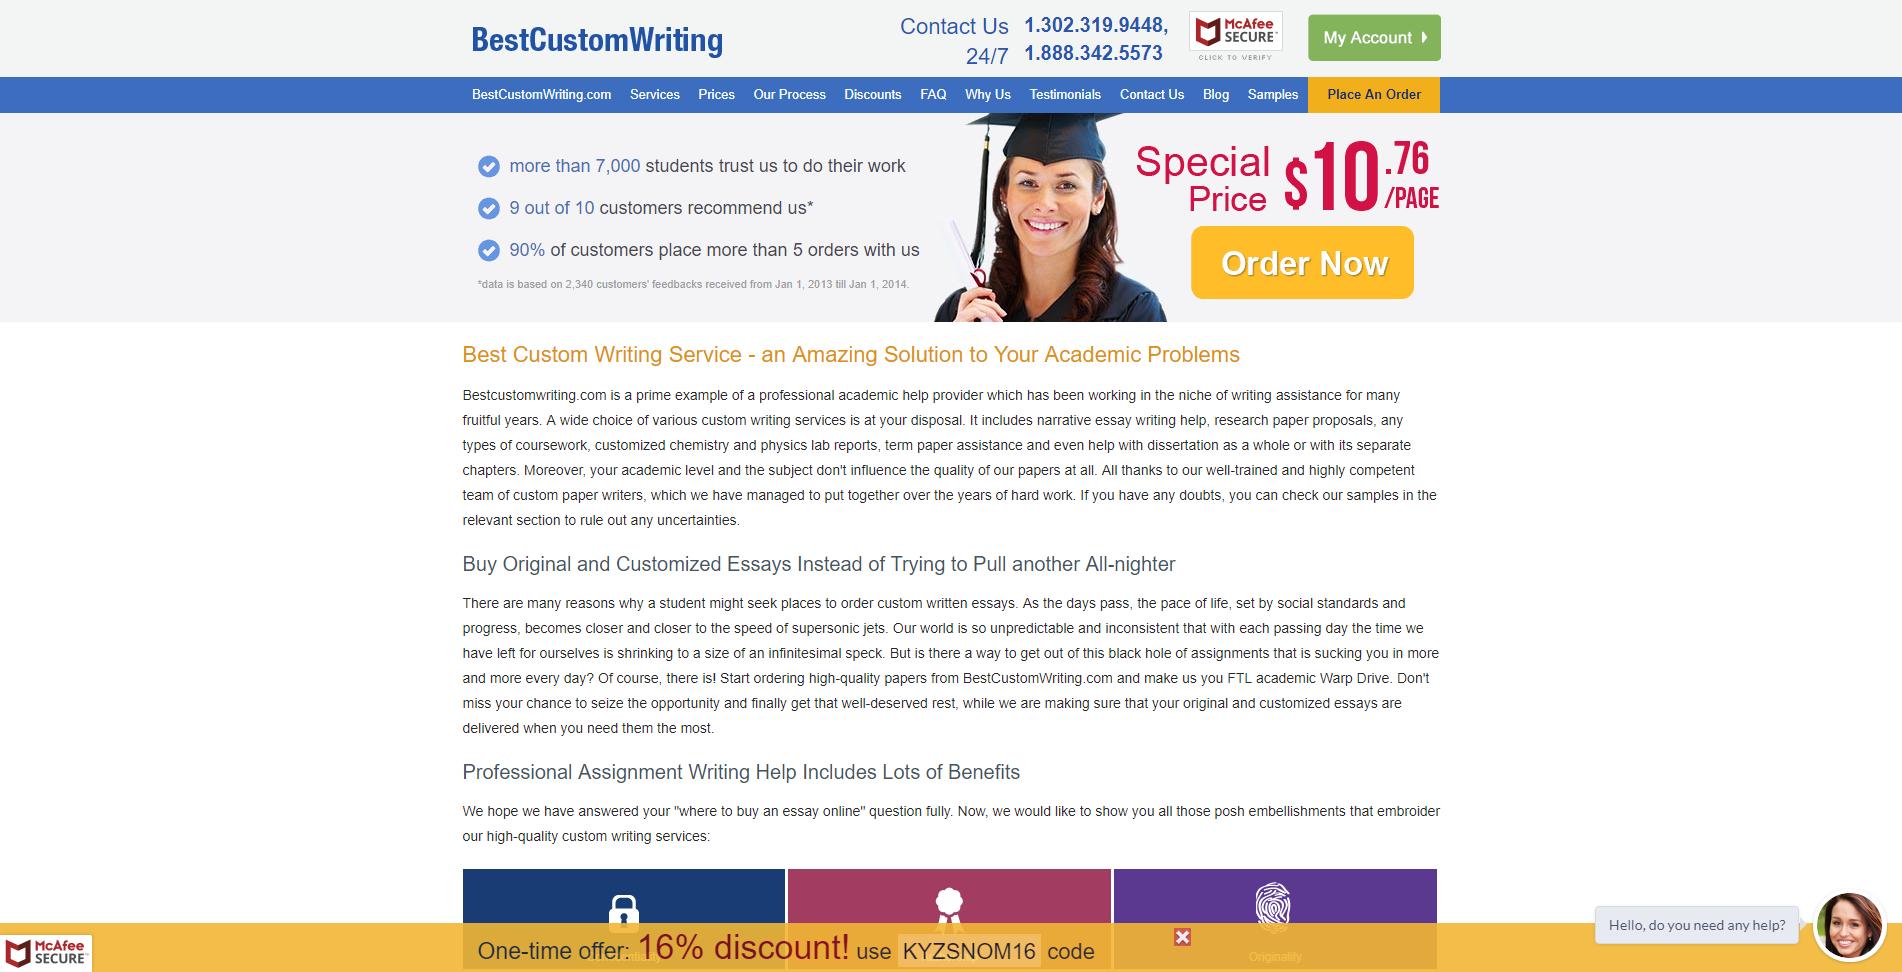 Bestcustomwriting.com - review